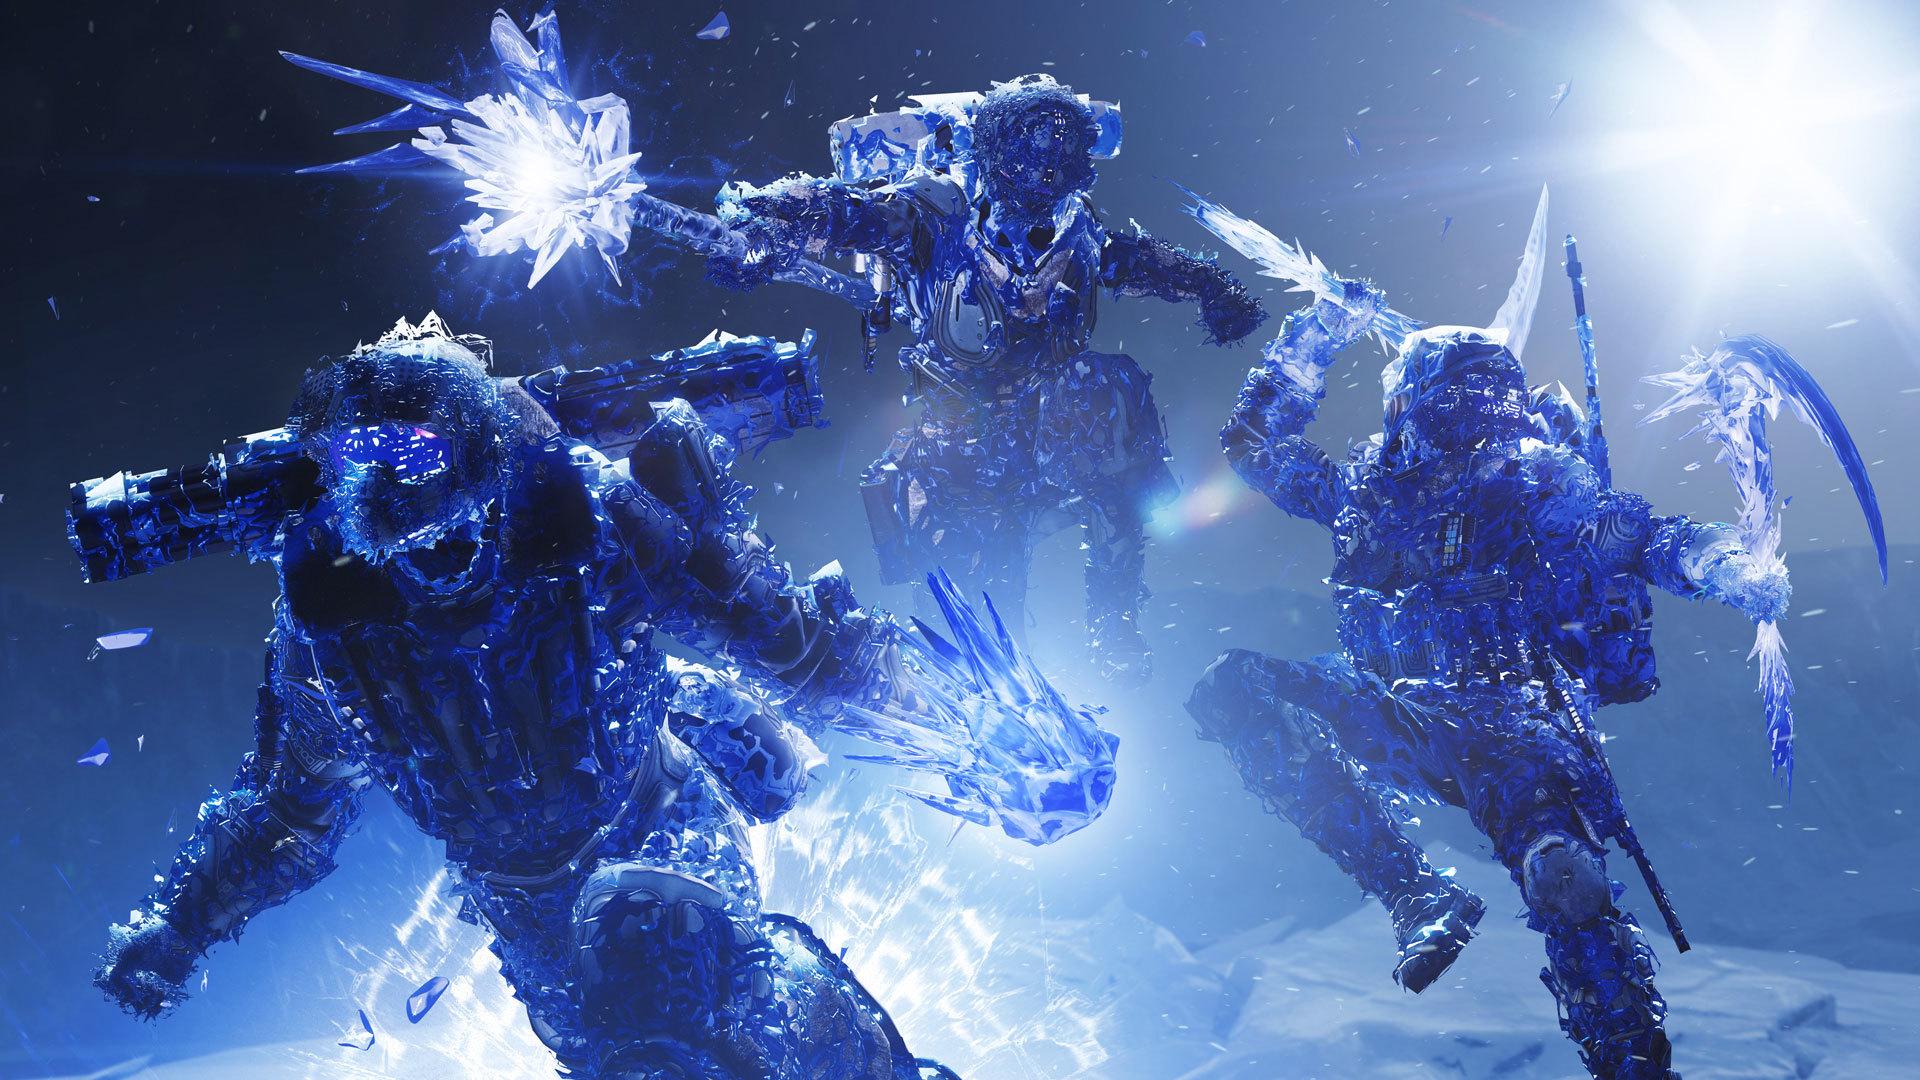 Destiny 2 Beyond Light Statis subclasses